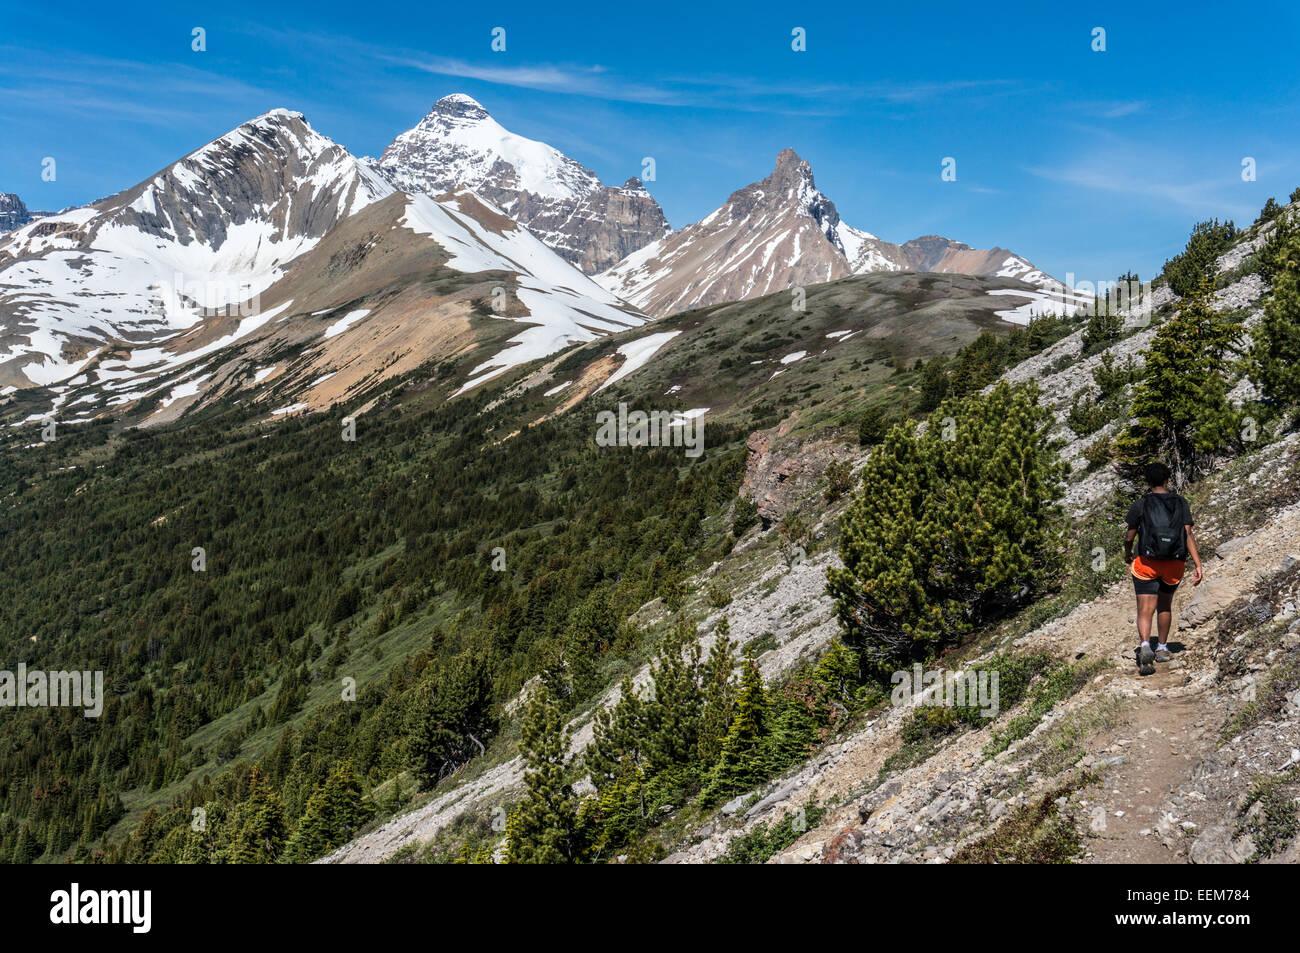 Canada, Alberta, Banff National Park, Canadian Rockies, Hiker walking along mountain - Stock Image